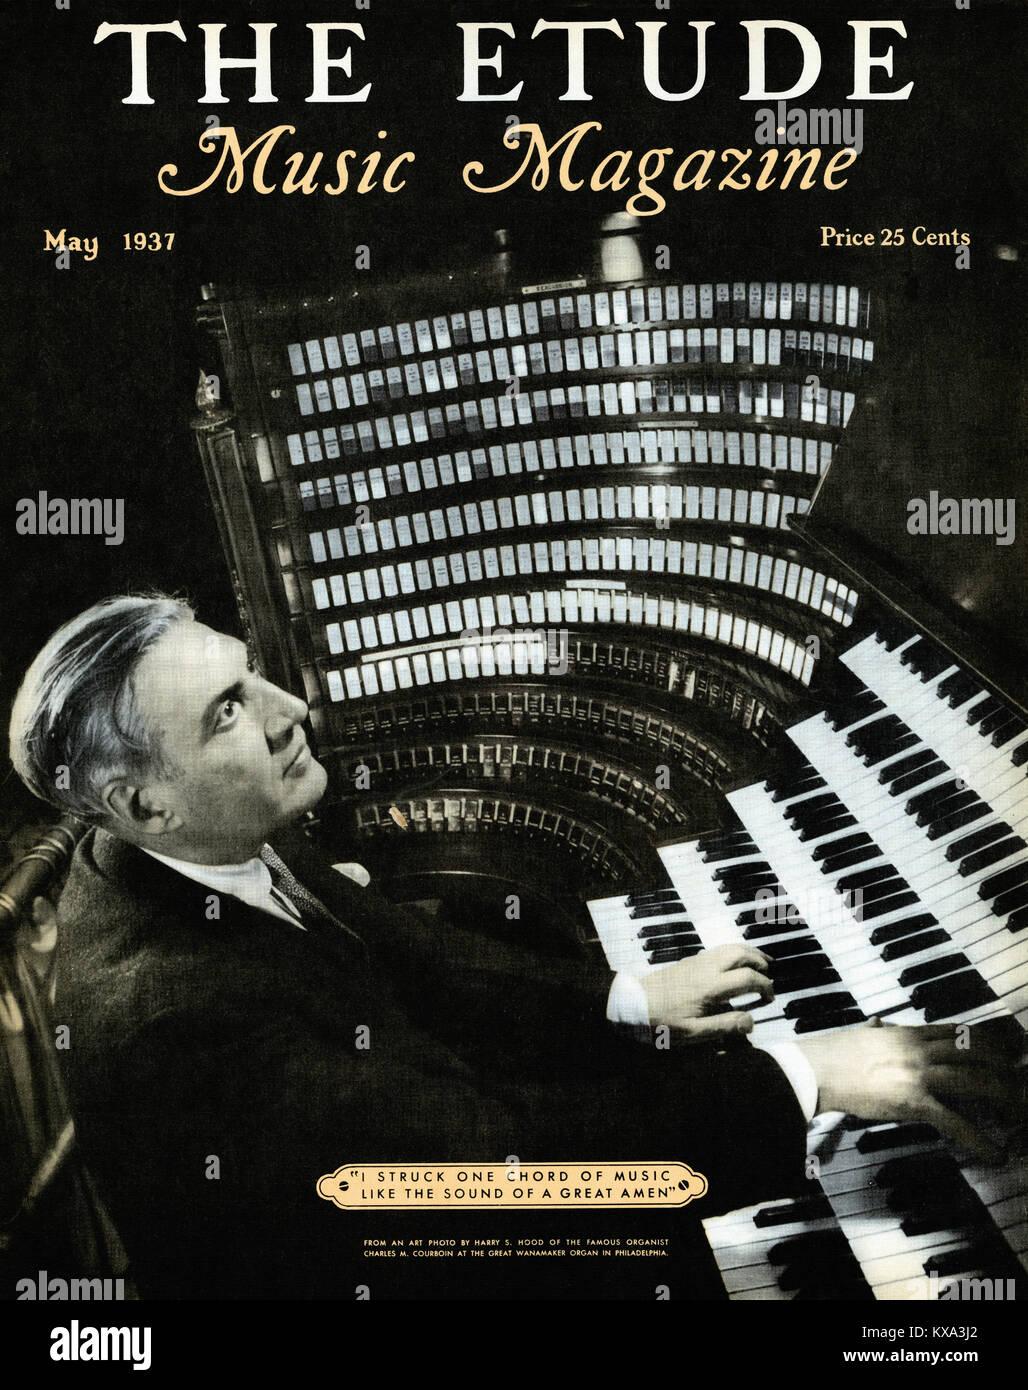 I Struck One Chord of Music Stock Photo   Alamy